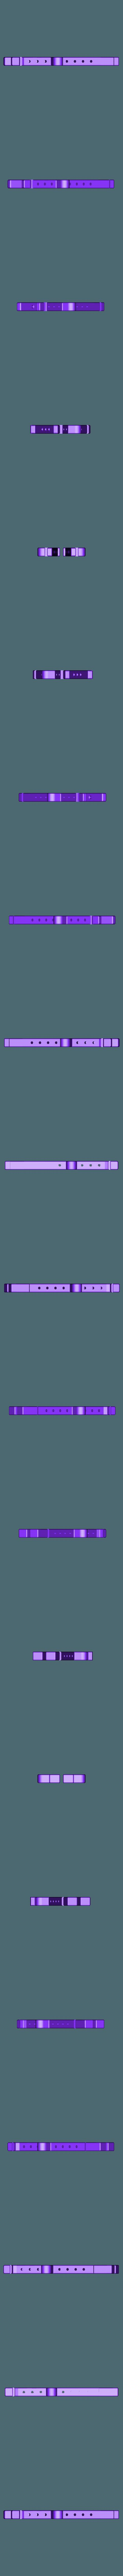 71 trkrear rail.stl Download STL file Ratrod Pickup • 3D printing template, macone1